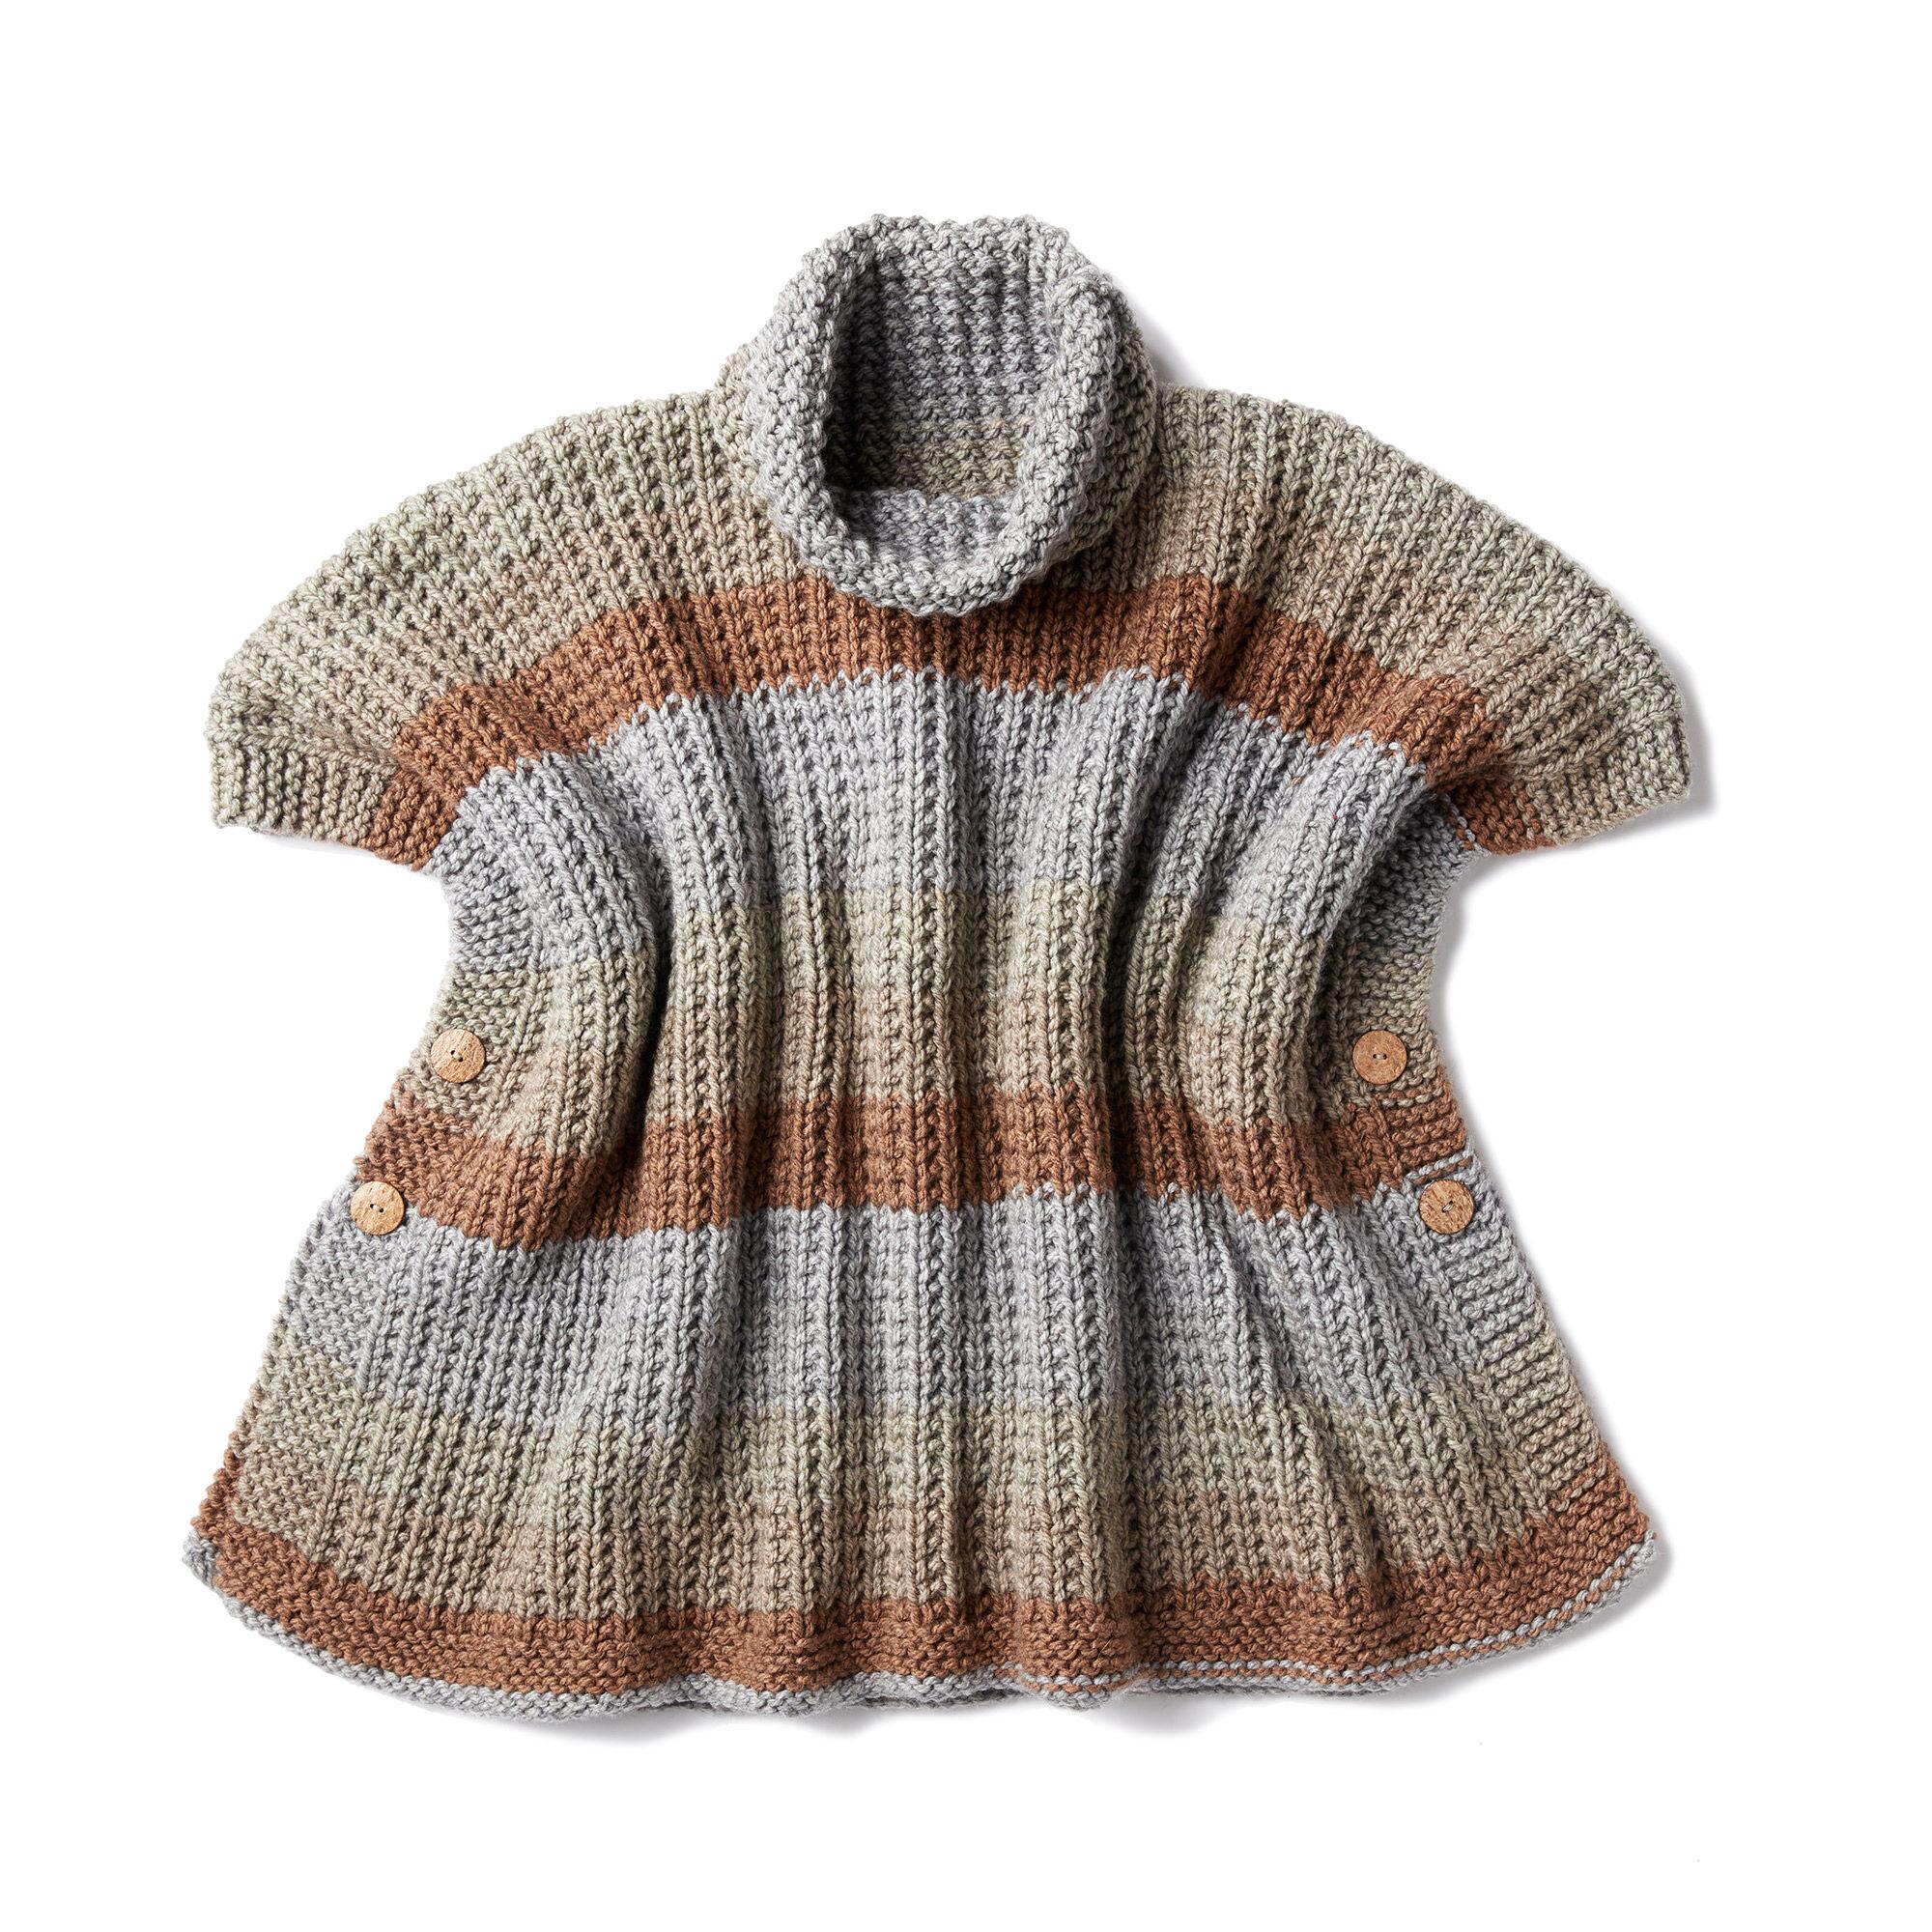 Caron Cozy Up Knit Poncho Pattern Yarnspirations